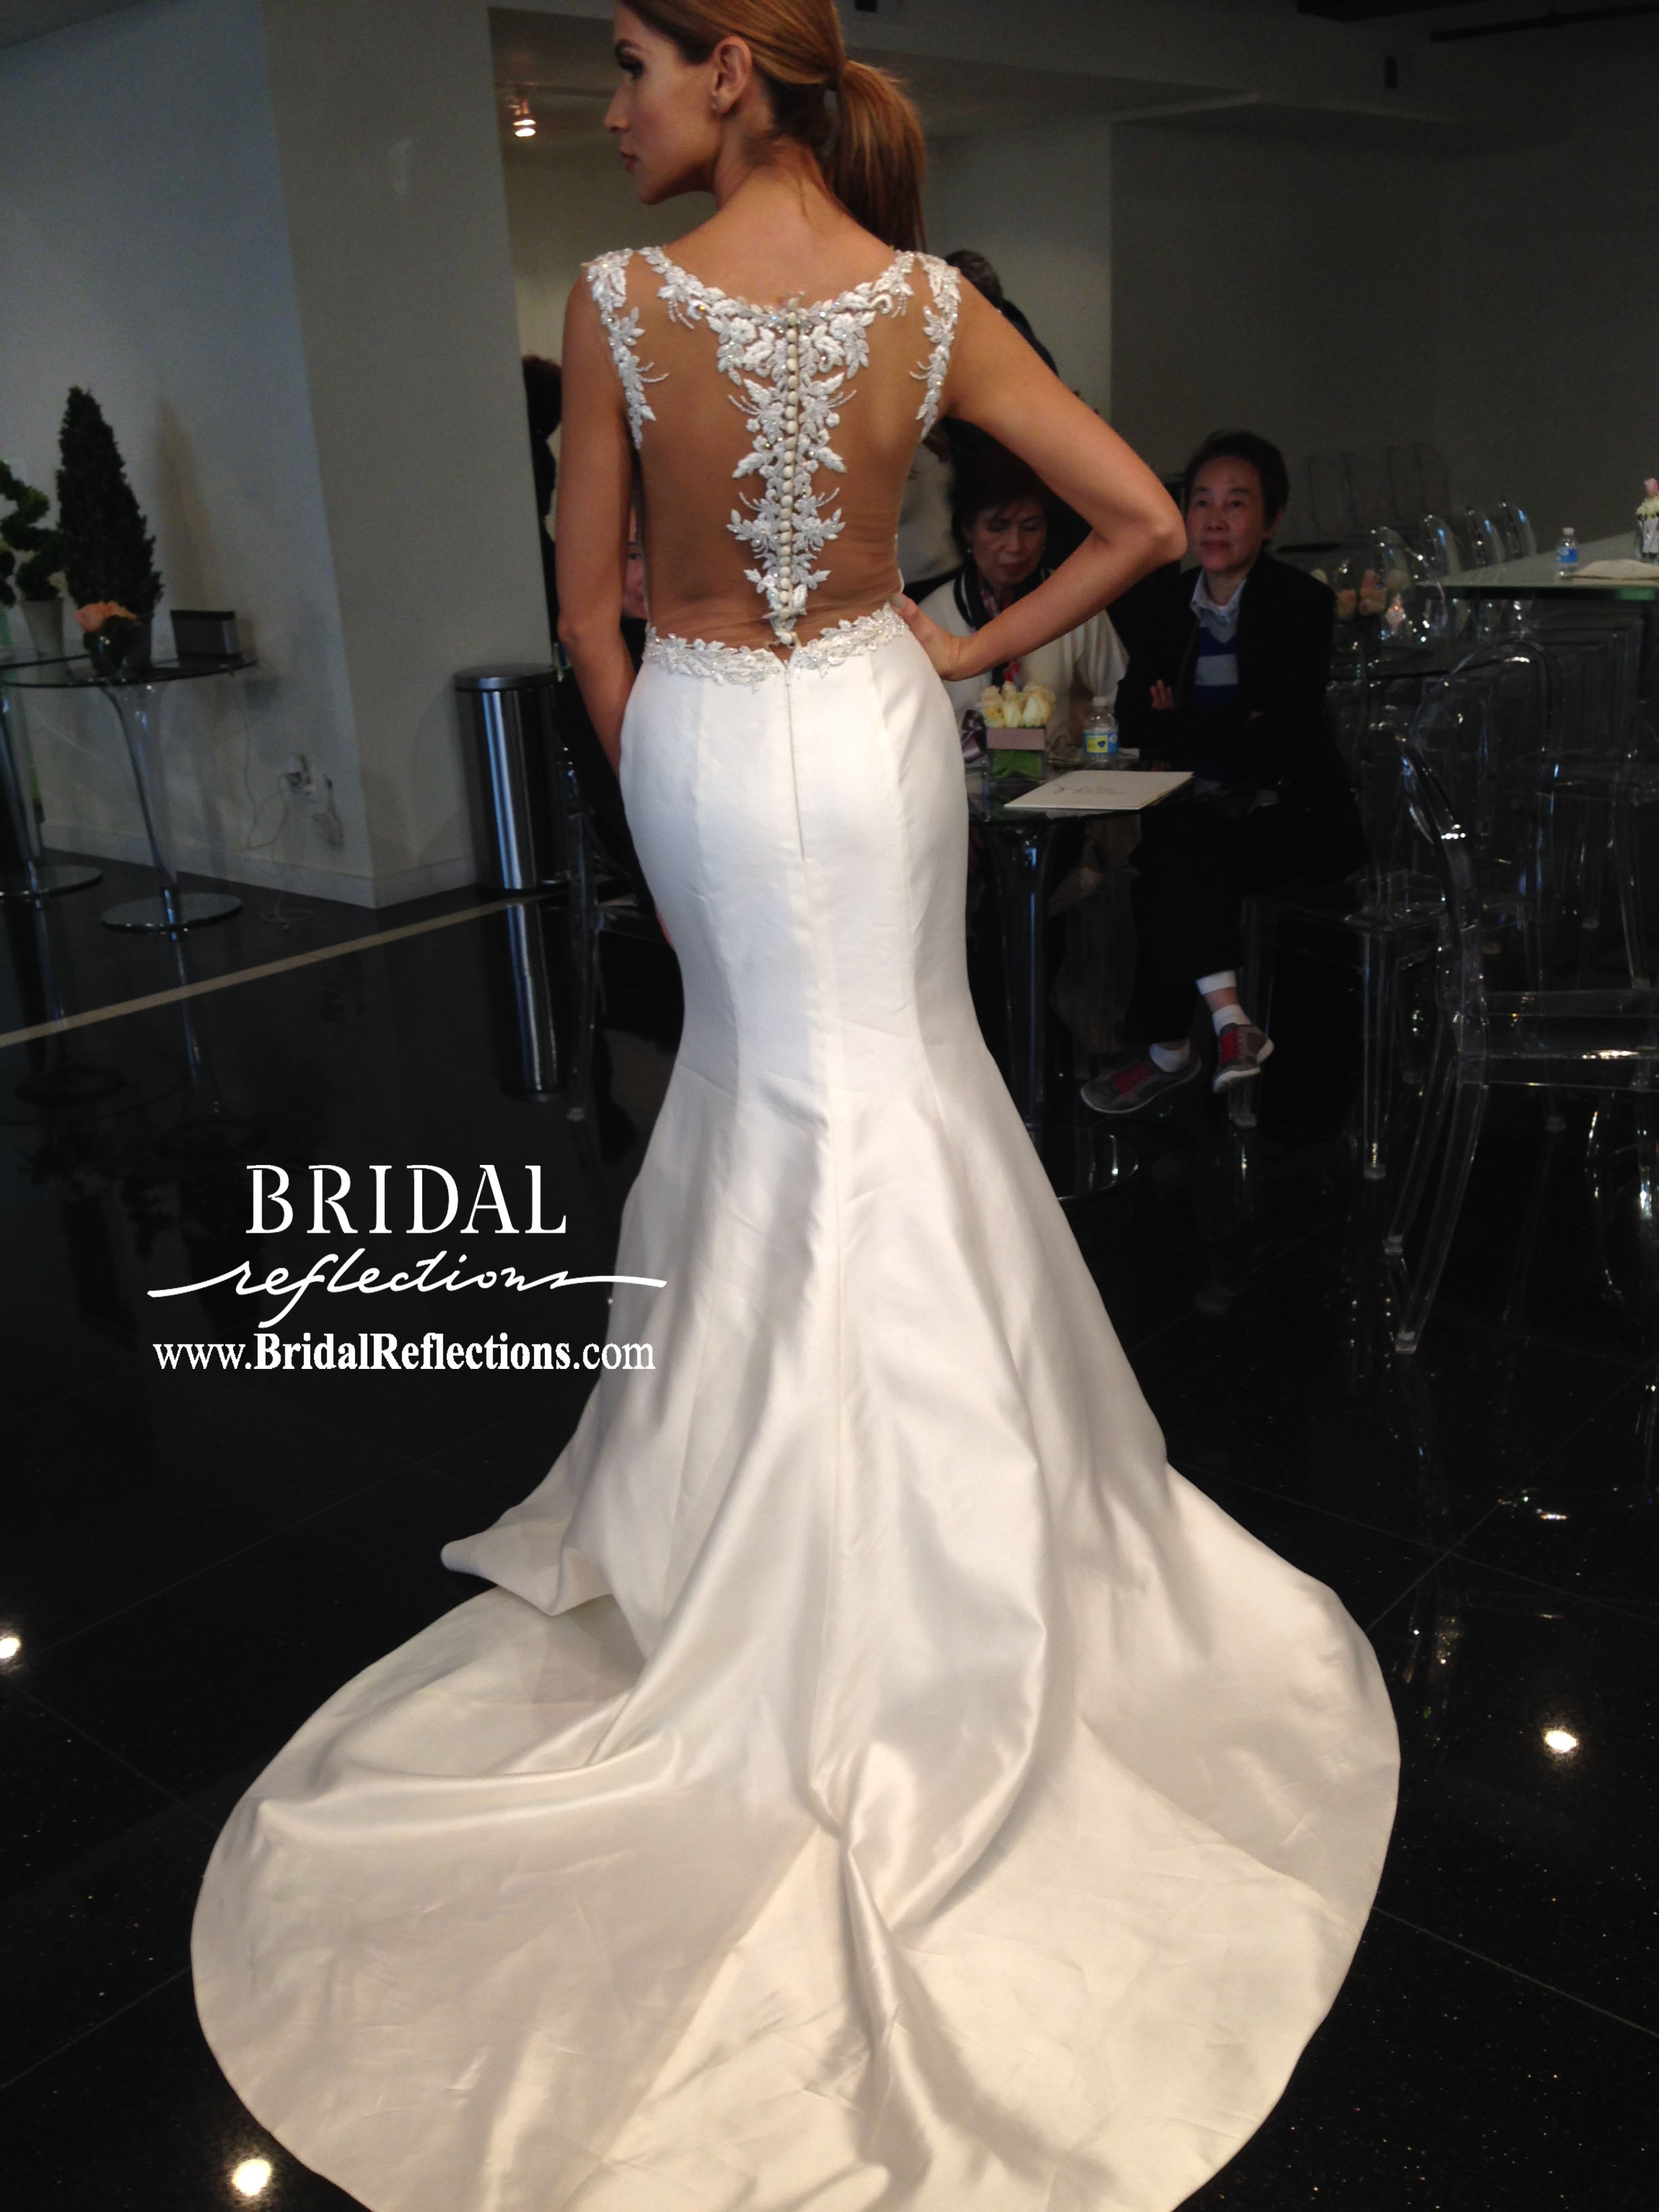 Simone carvalli wedding dresses wedding dresses asian for Custom wedding dress near me